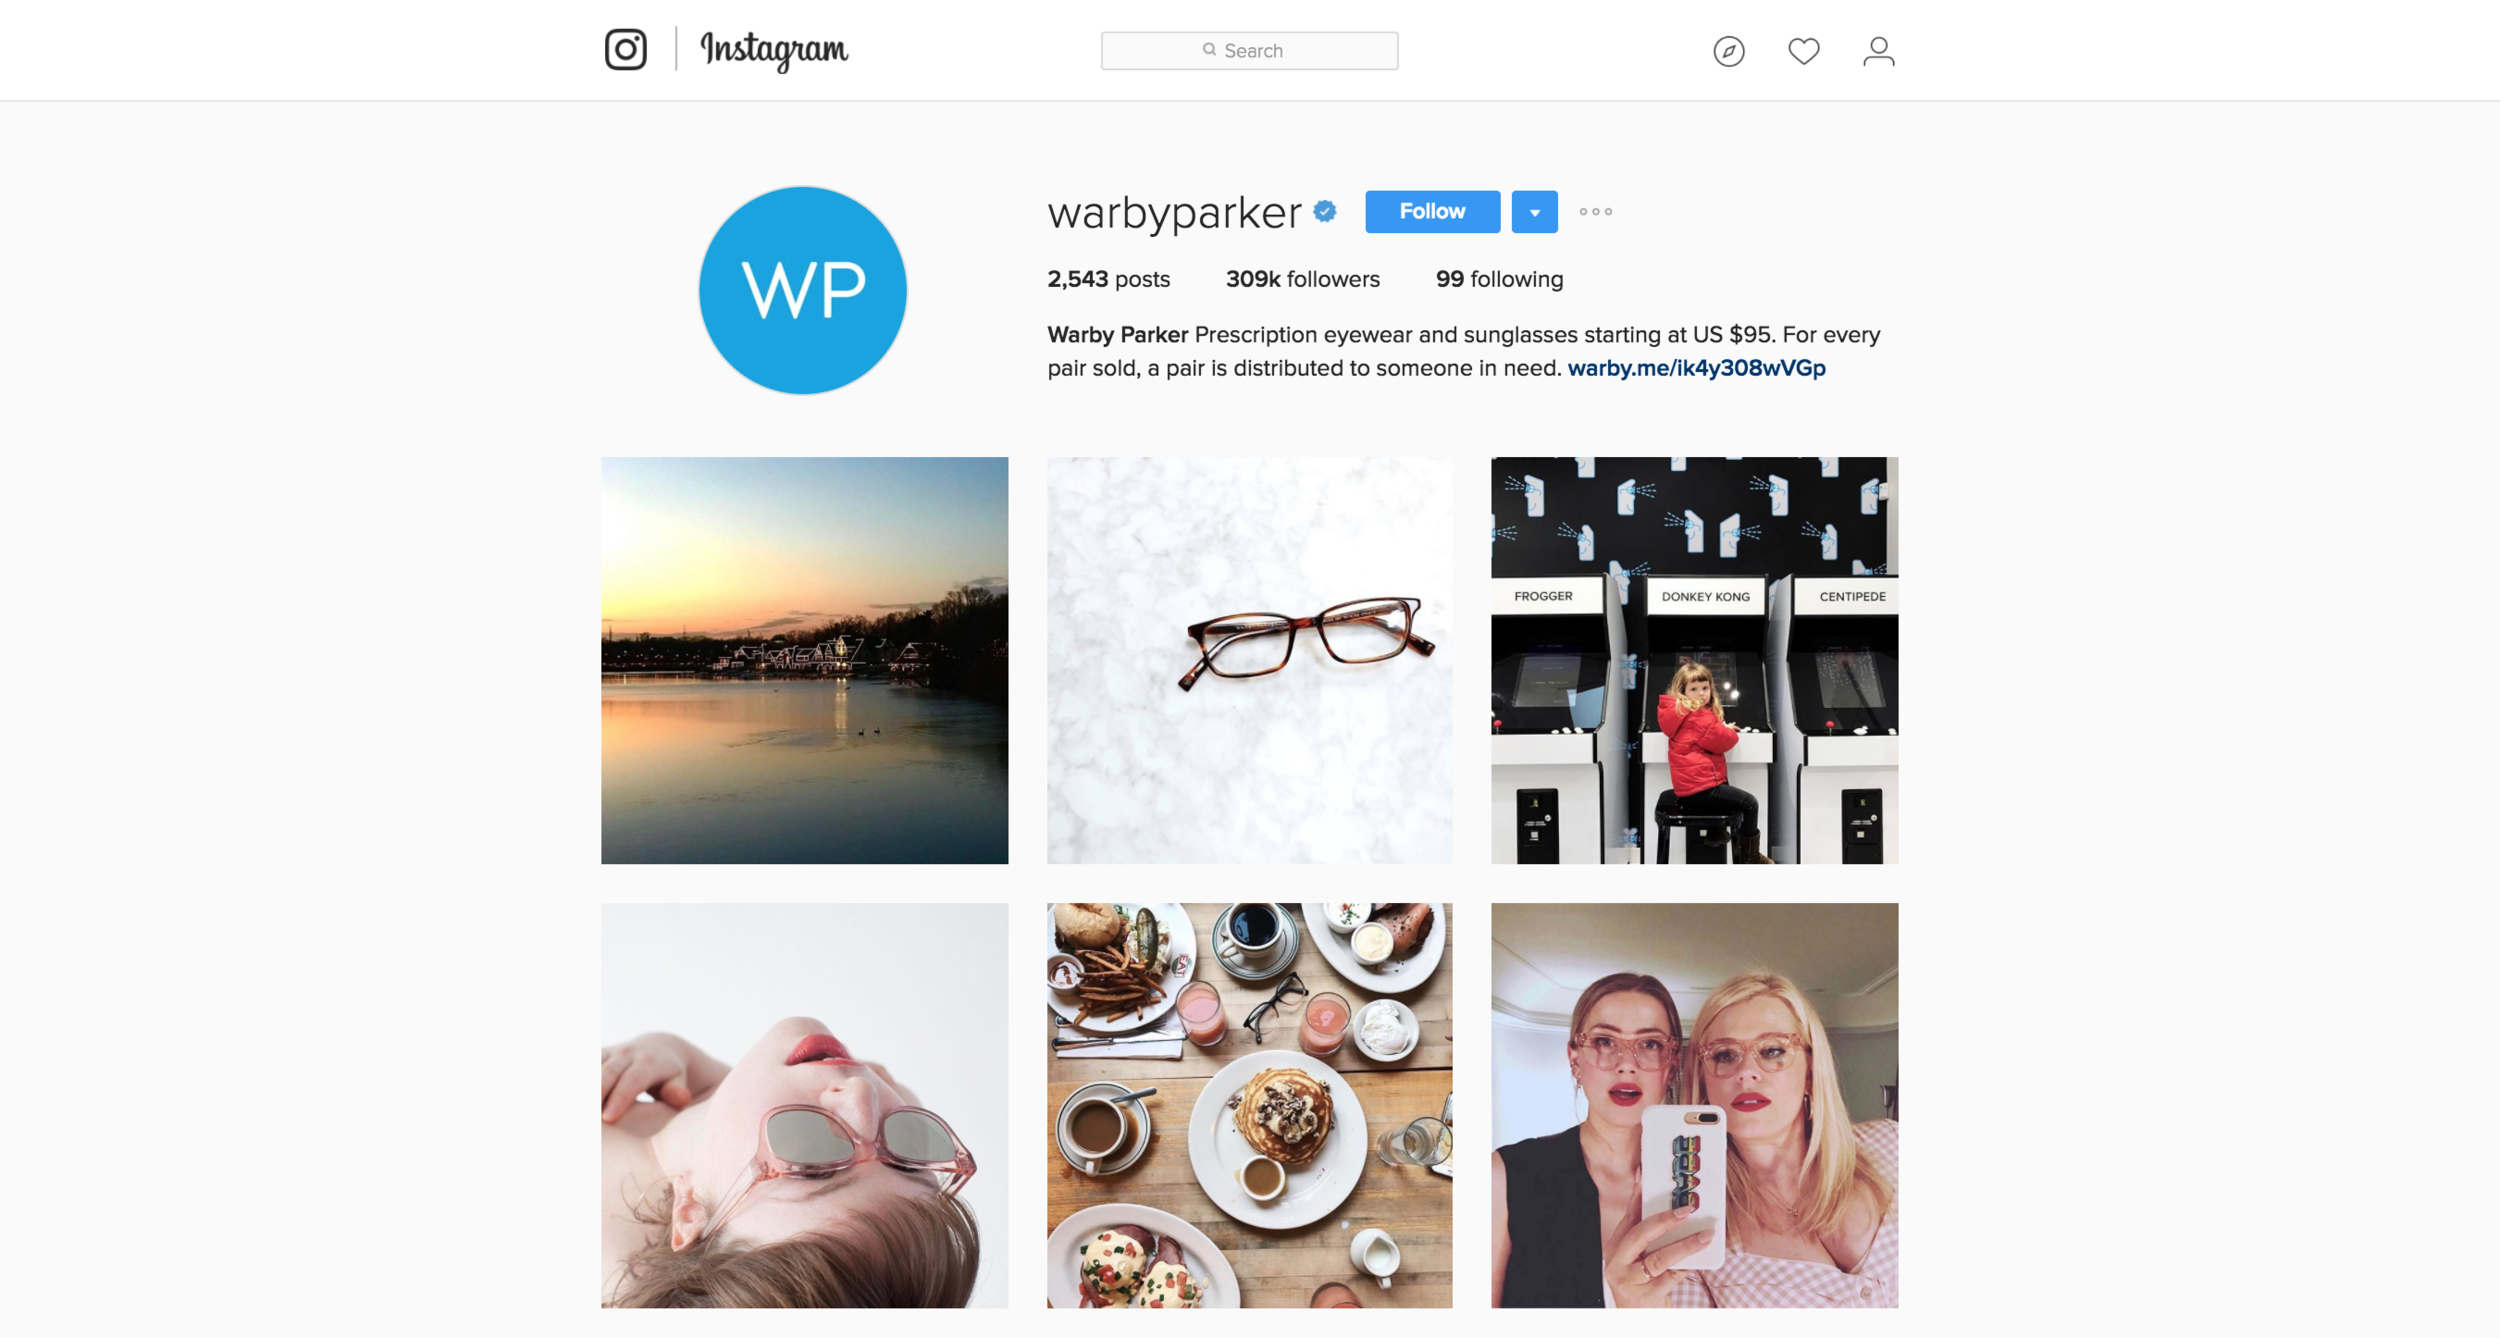 Warby Parker on Instagram @WarbyParker